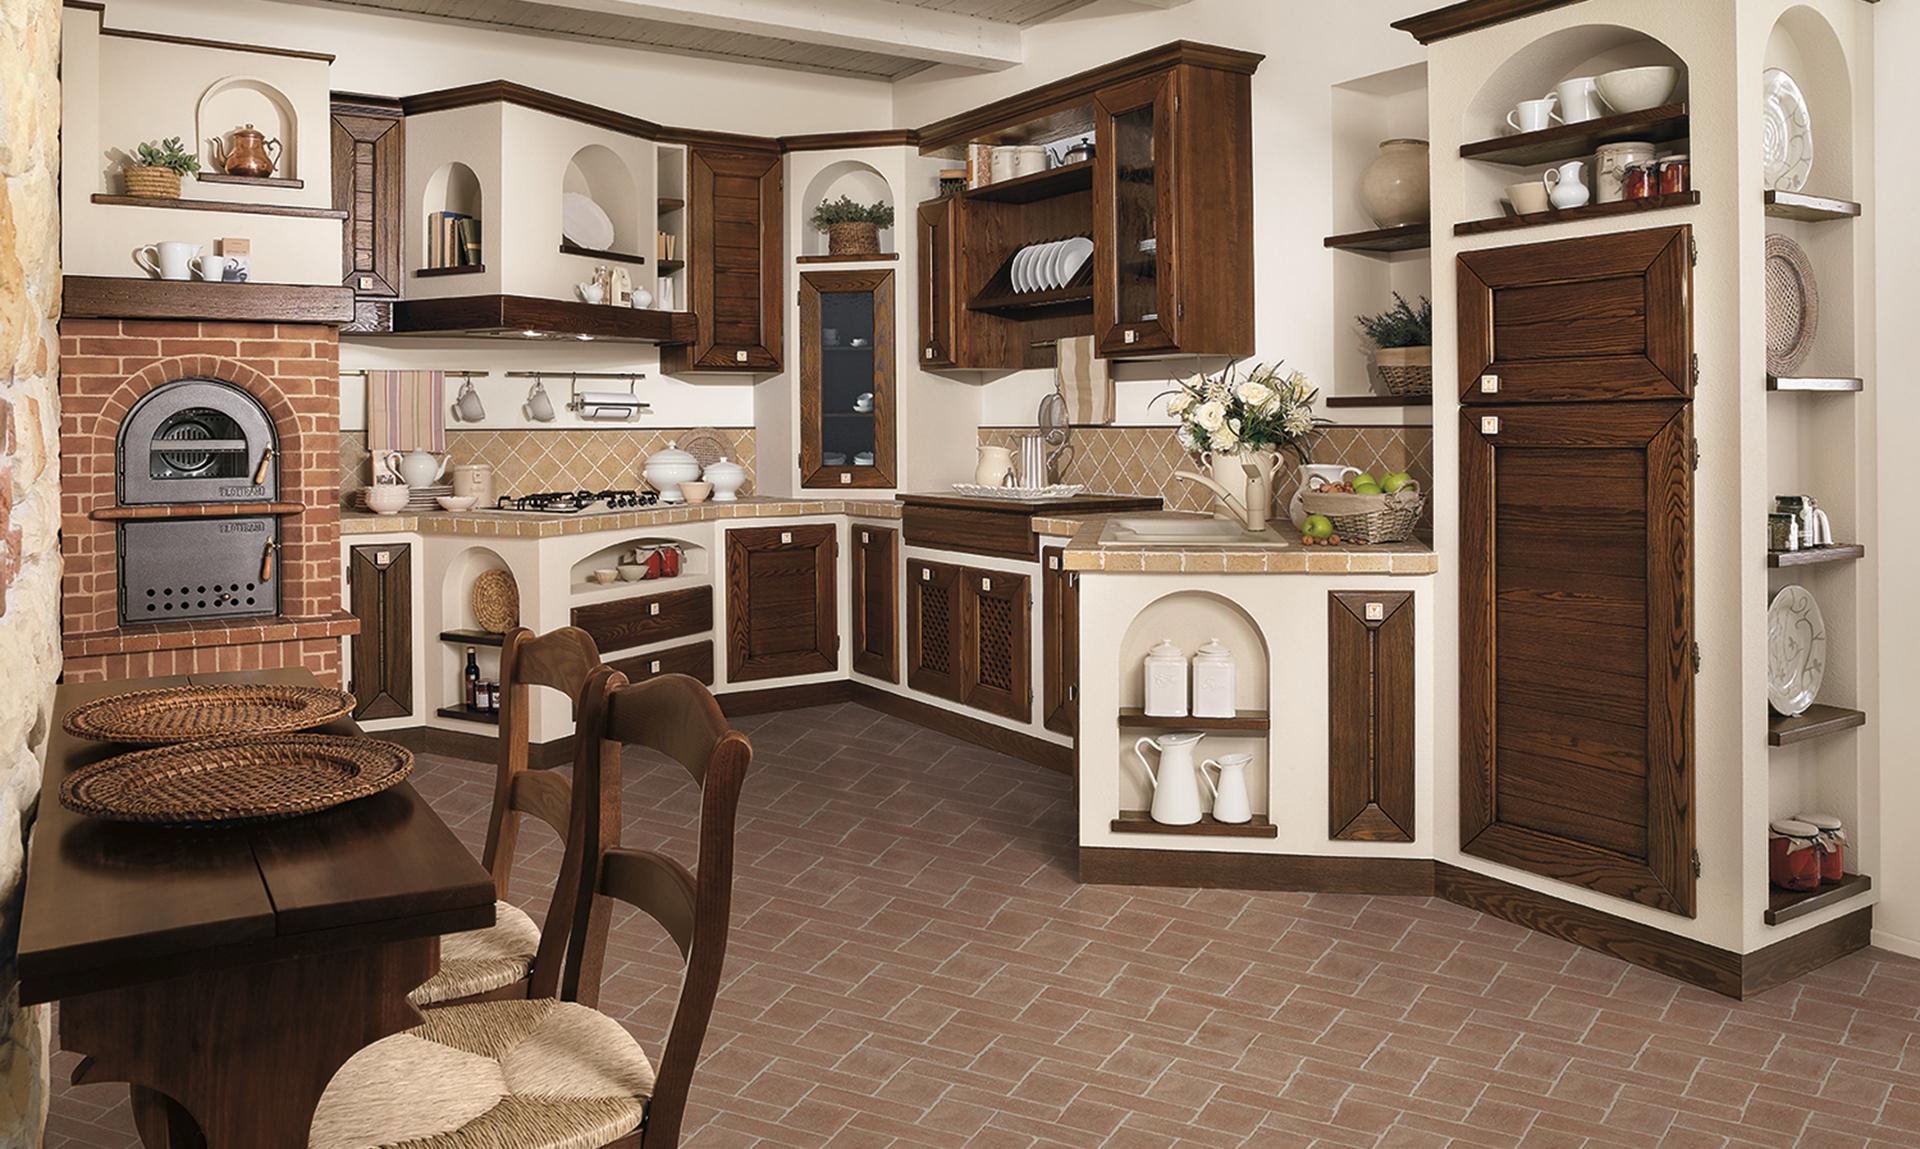 Luisa Rustic white - Borgo Antico Kitchens - The LUBE Group